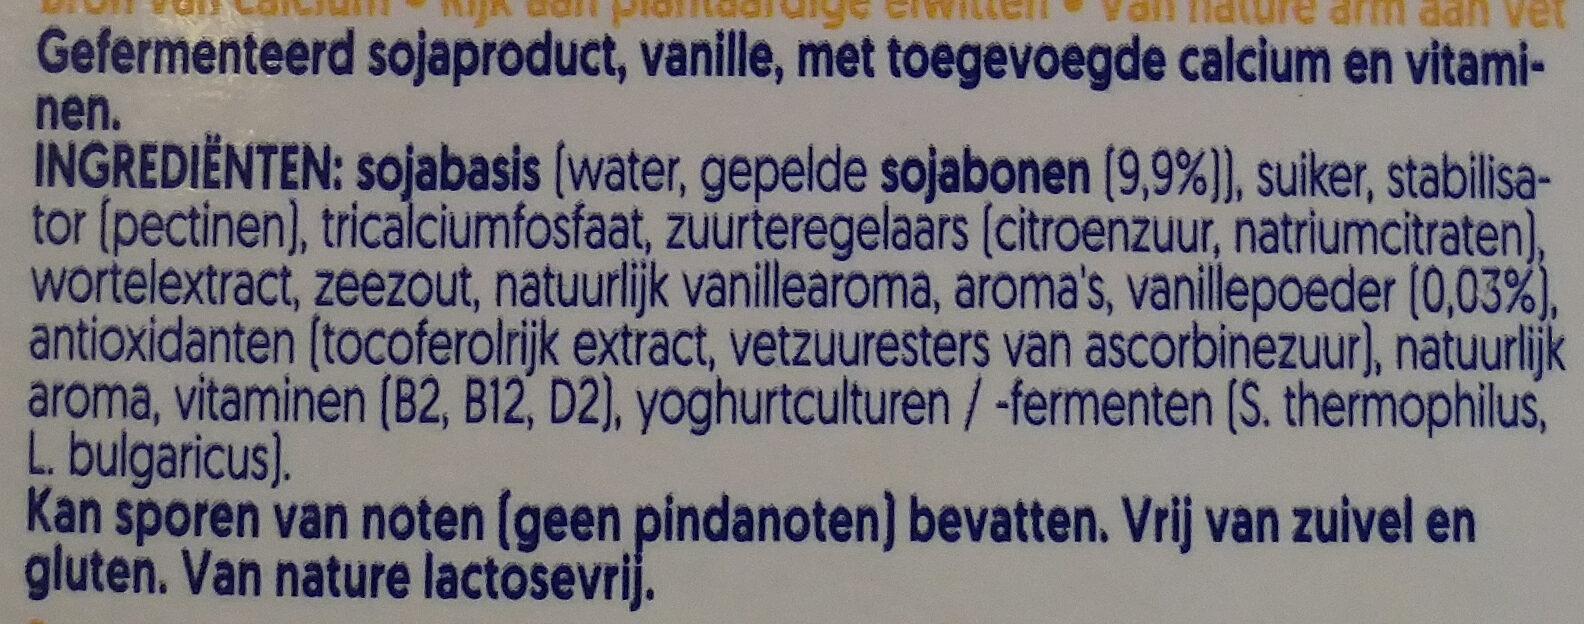 Mild & Creamy Vanille - Ingredients - nl